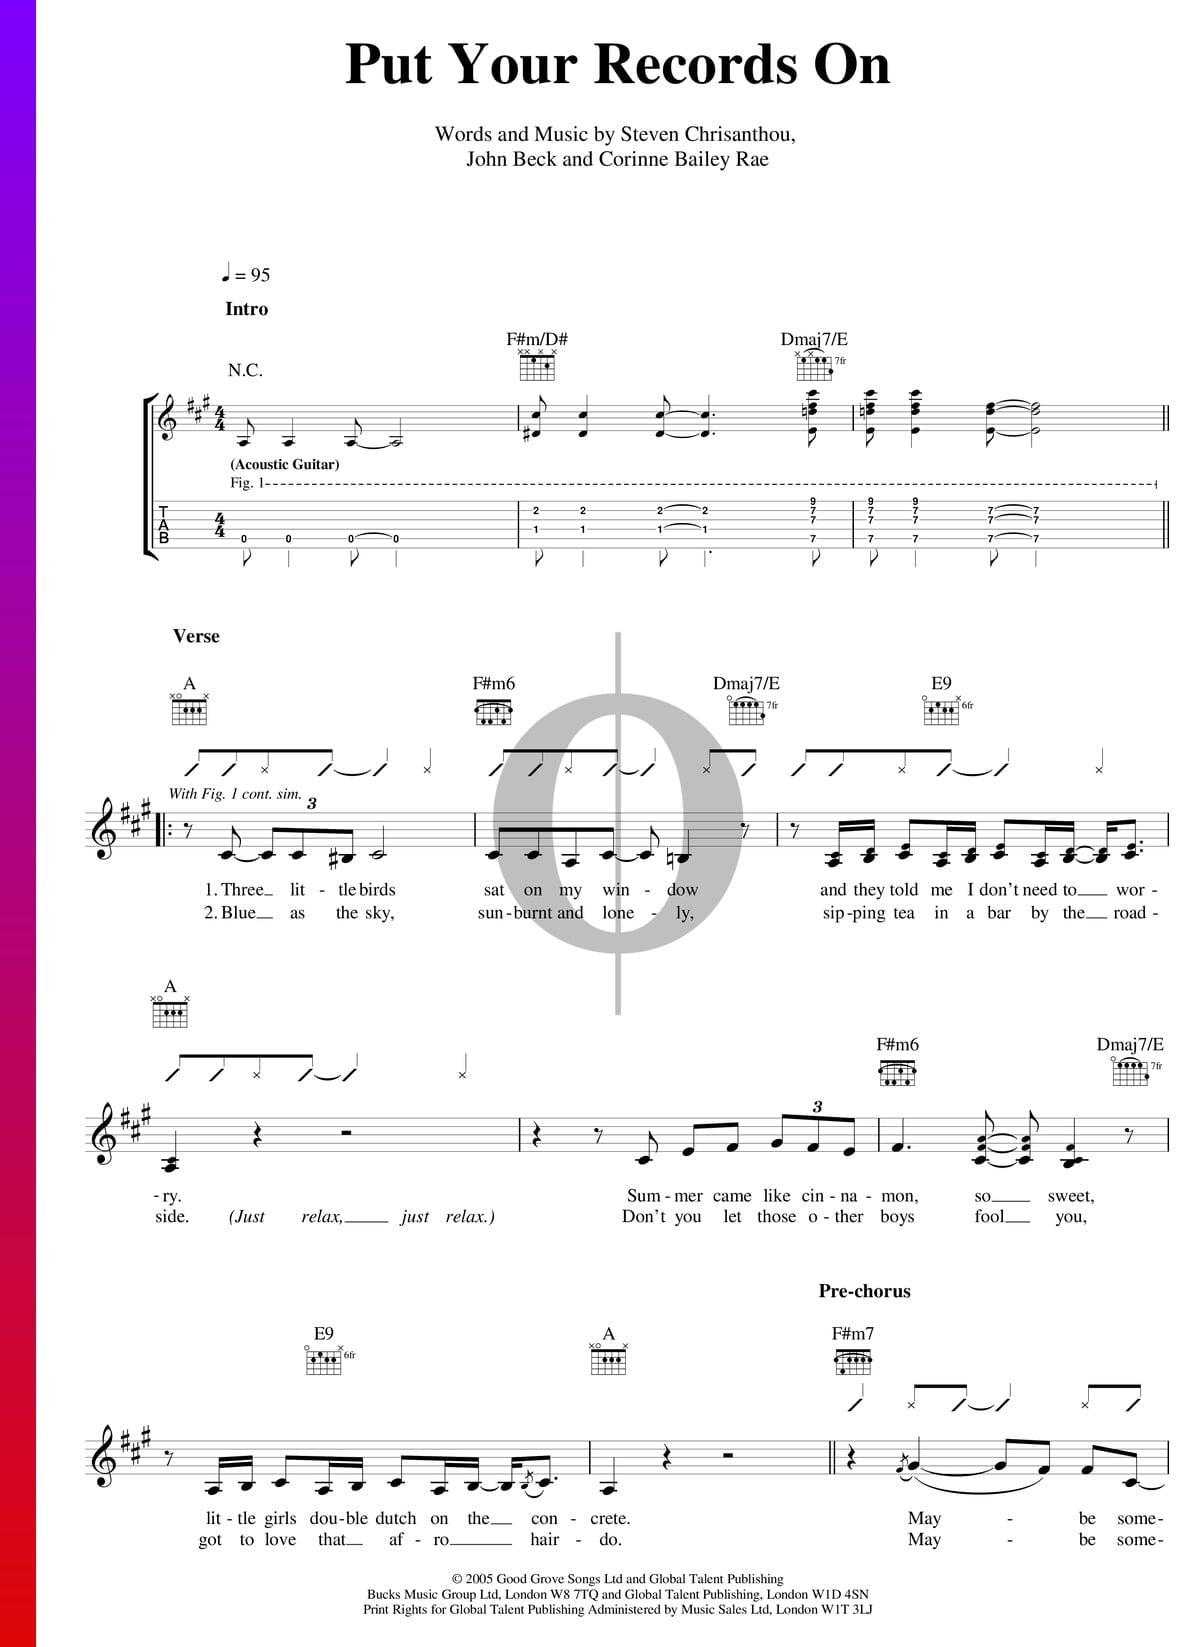 CORINNE RECORDS ON BAILEY BAIXAR MUSICA PUT YOUR DE RAE